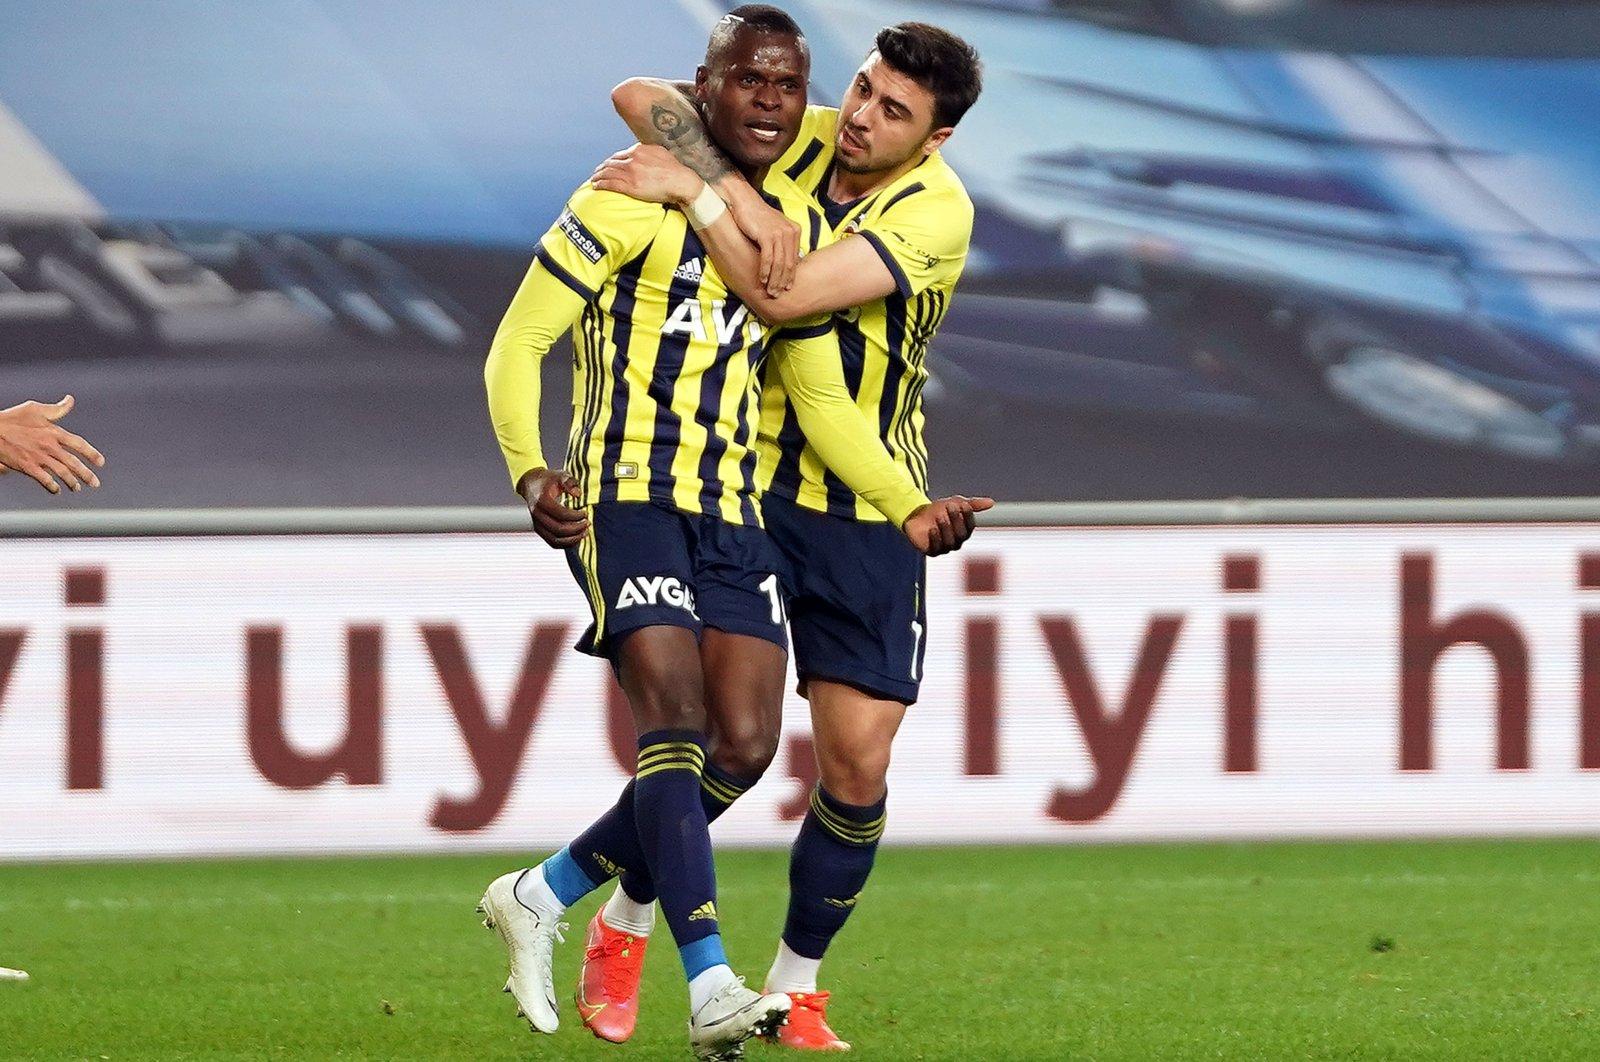 Fenerbahçe strikerMbwana Samatta (L) celebrates with teammate Ozan Tufan after scoring a goal against Denizlispor in the Turkish Süper Lig, Istanbul, Turkey, April 5, 2021.